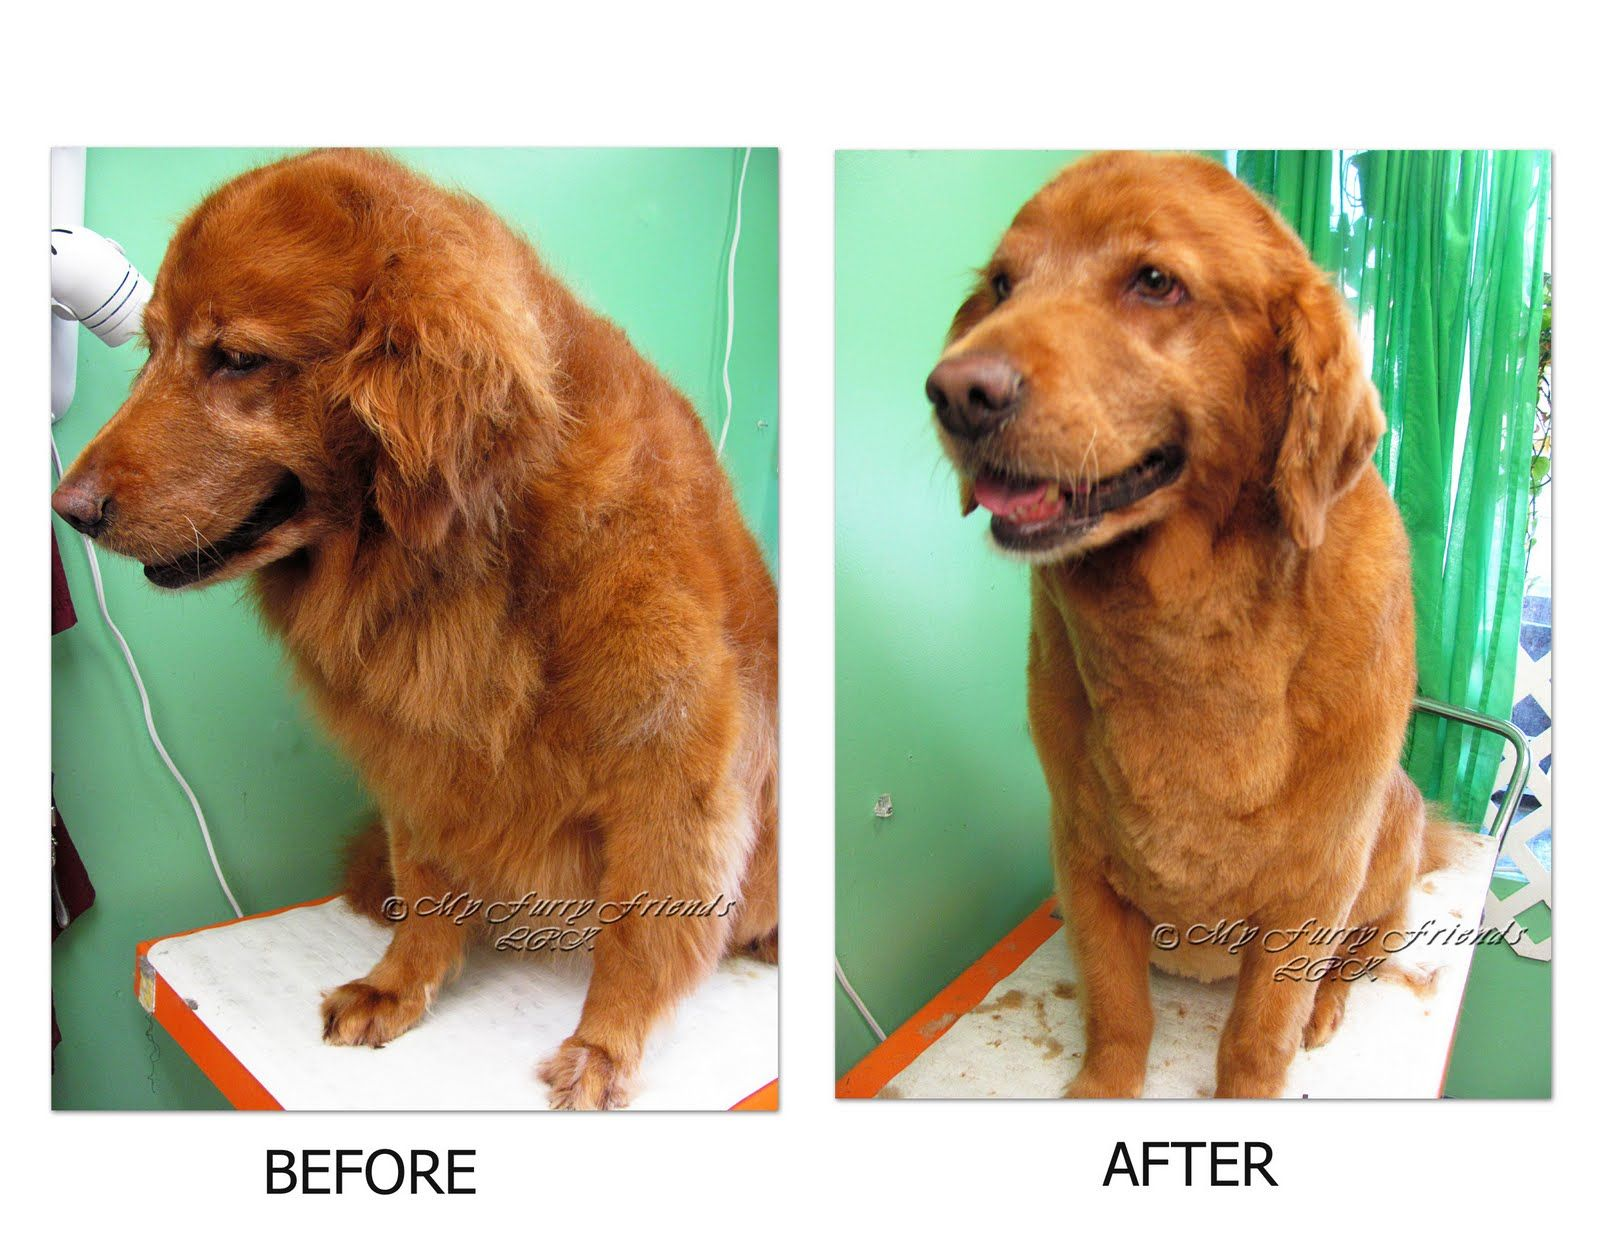 Golden retriever grooming singapore